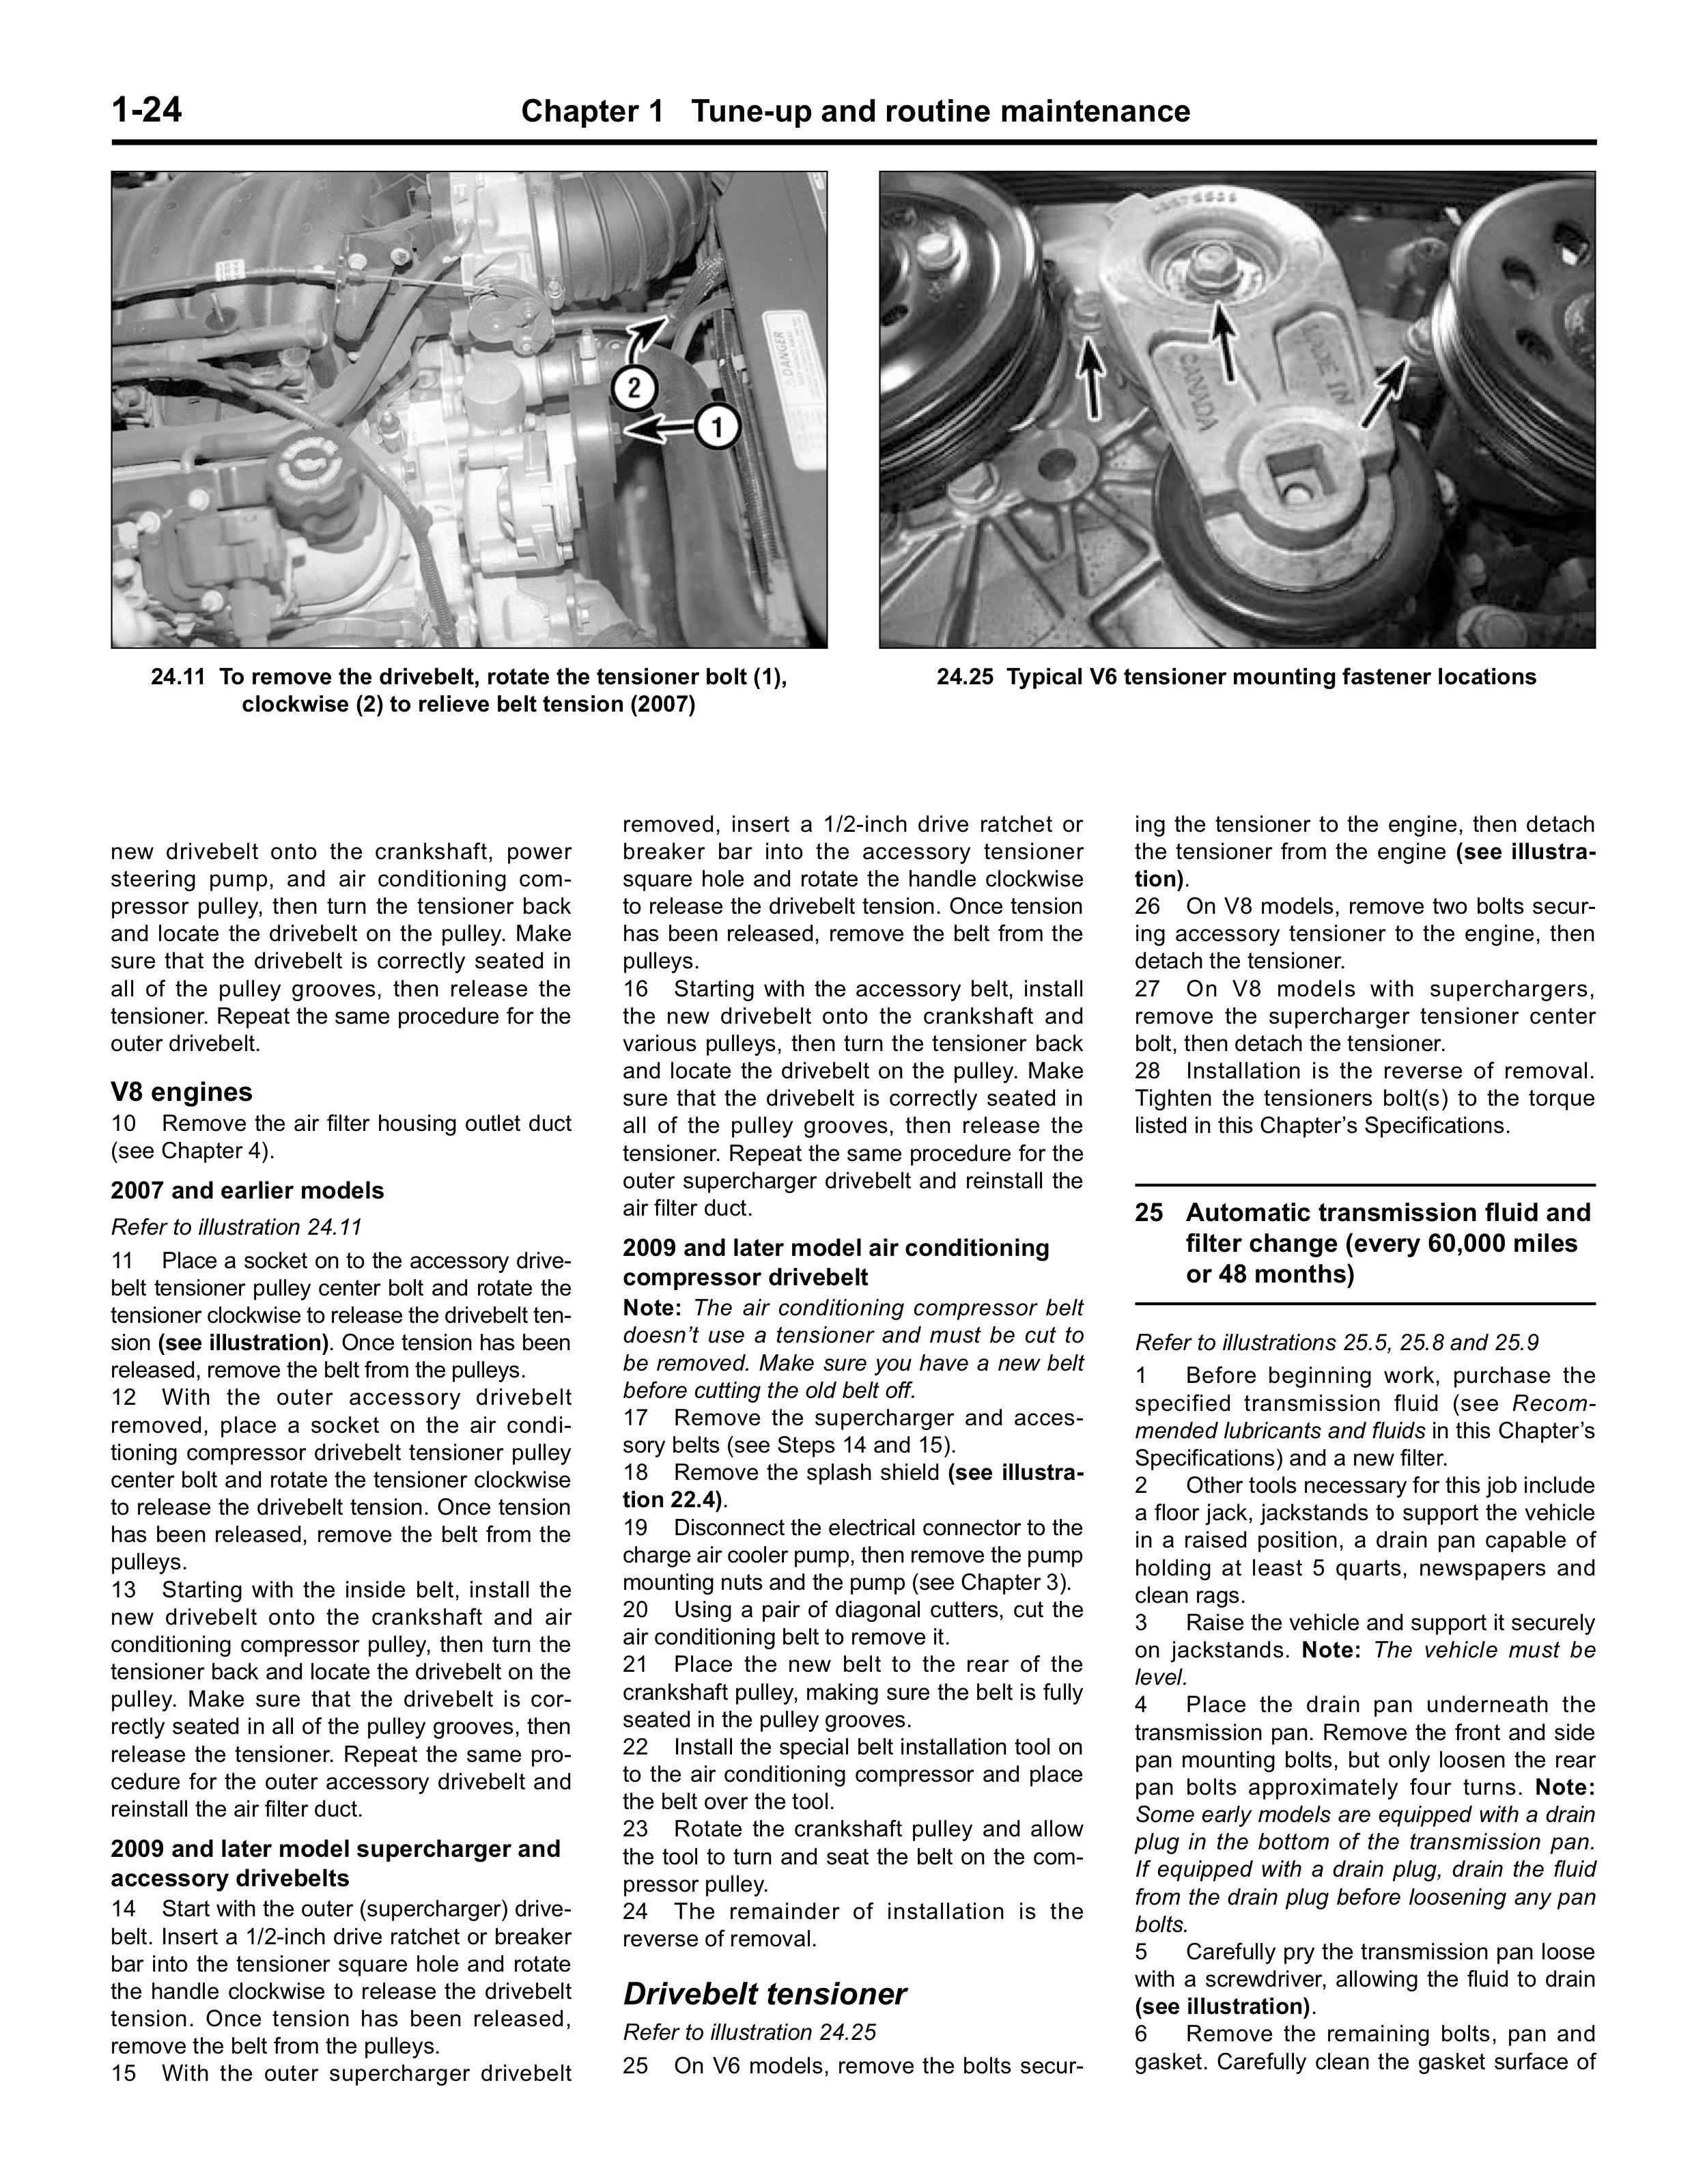 acura integra 90 93 legend 91 95 haynes repair manual haynes rh haynes com 1992 acura integra service manual 93 Acura Integra